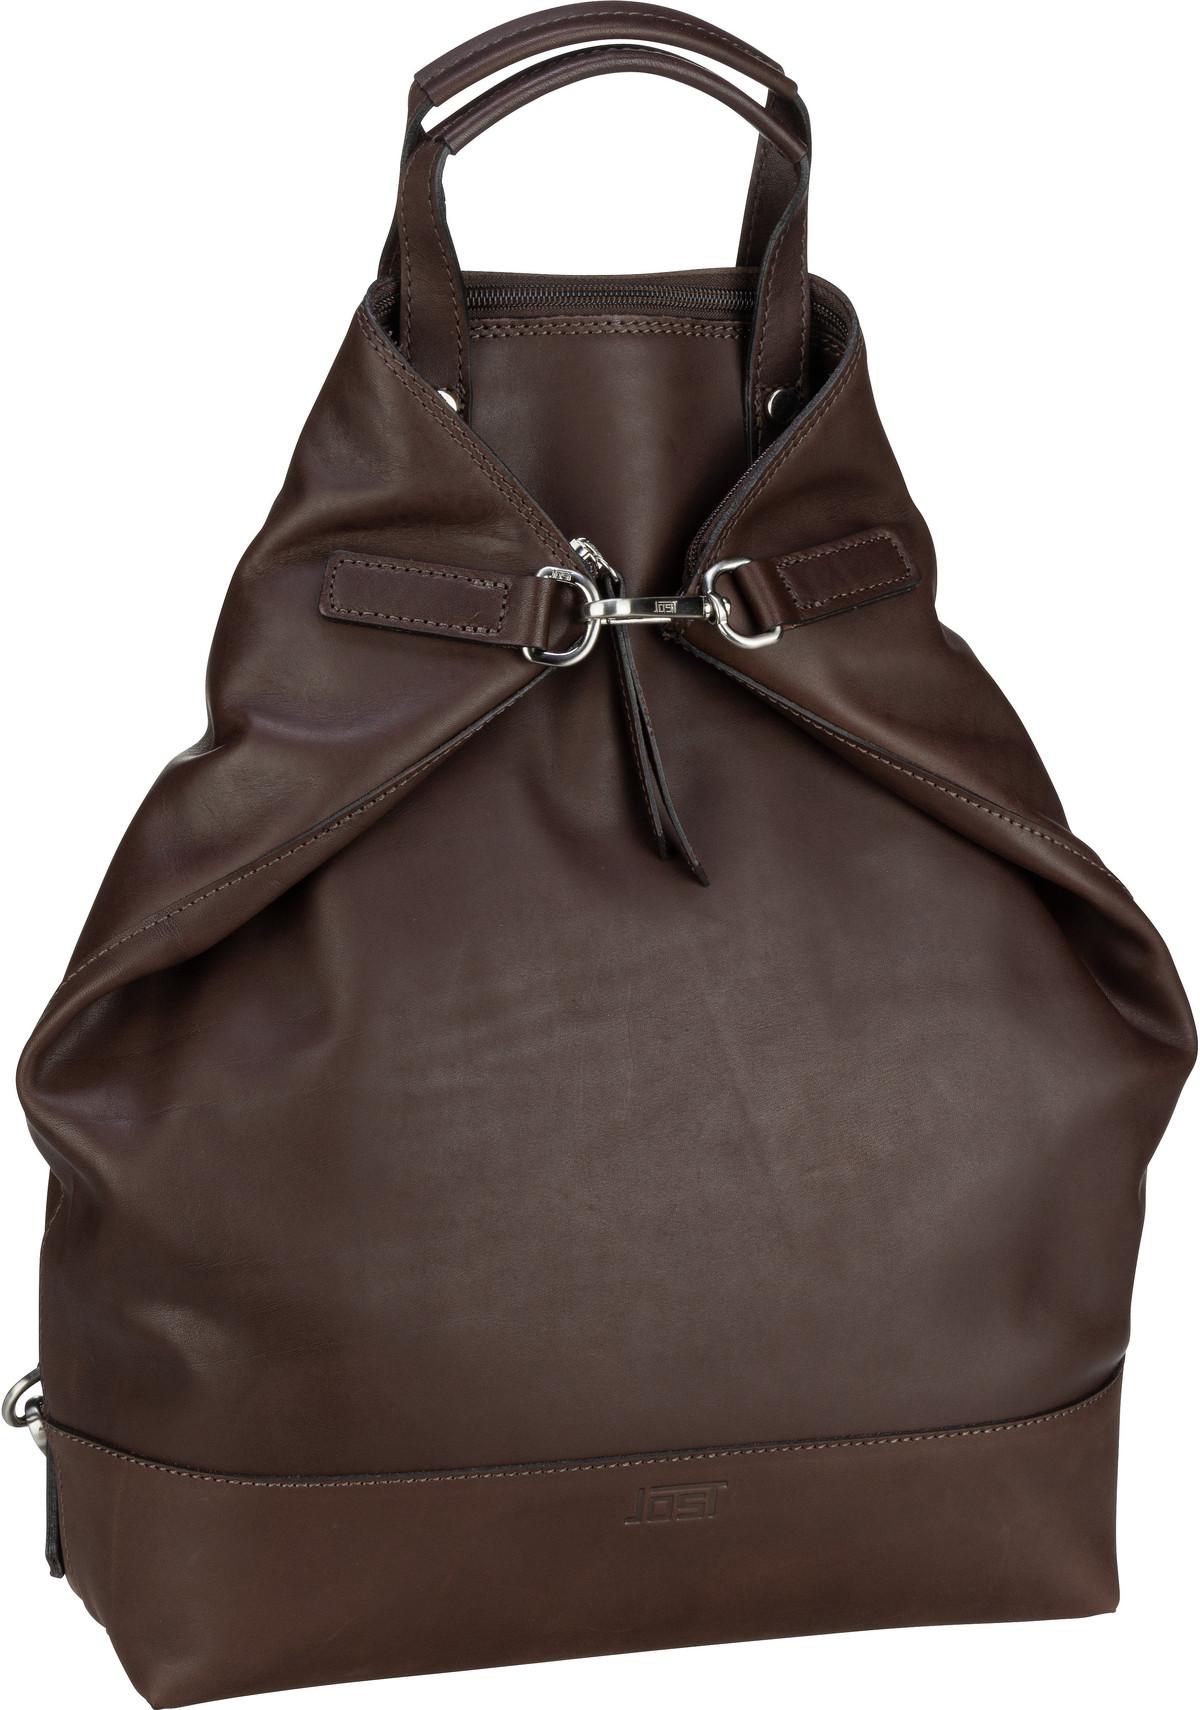 Rucksack / Daypack Rana 1207 X-Change 3in1 Bag S Mocca